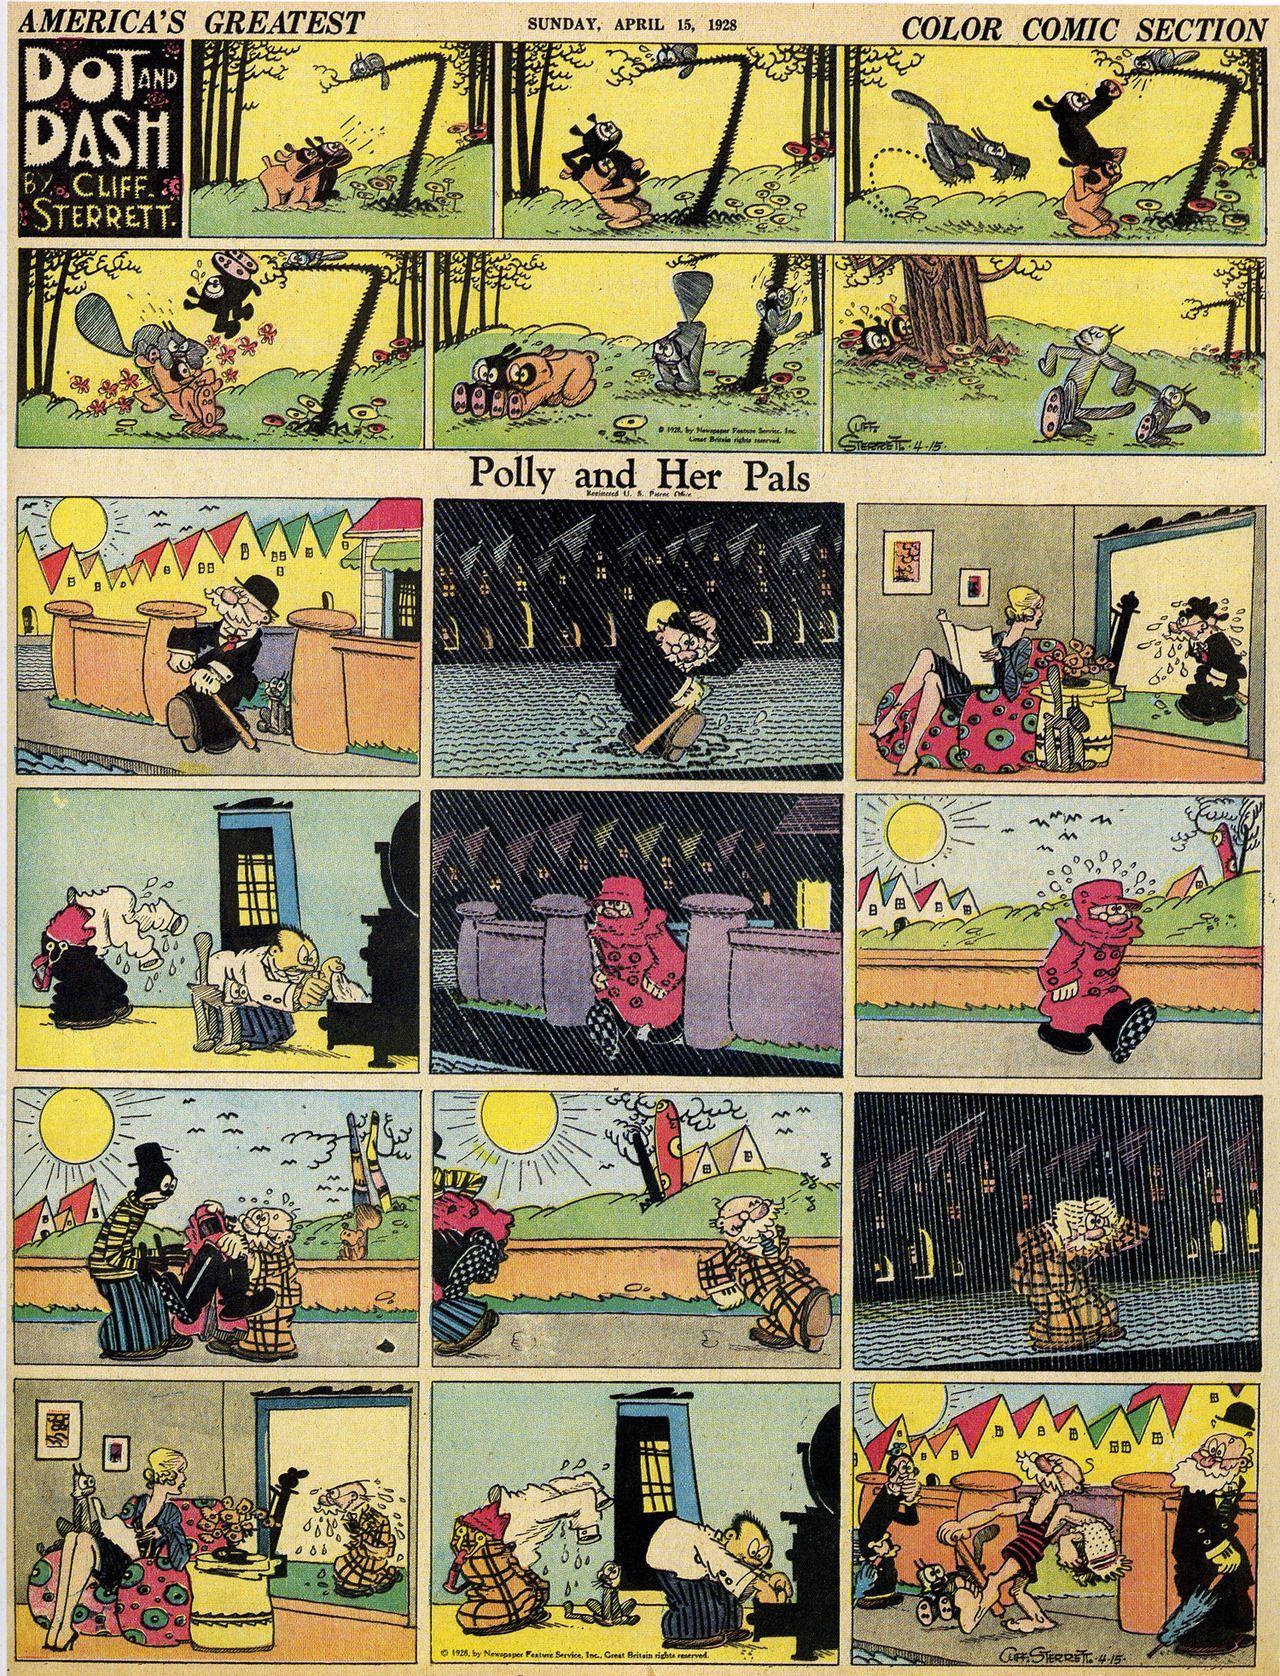 "Polly and Her Pals med ""toppern"" Dot and Dash av Cliff Sterrett från 15 april 1928"